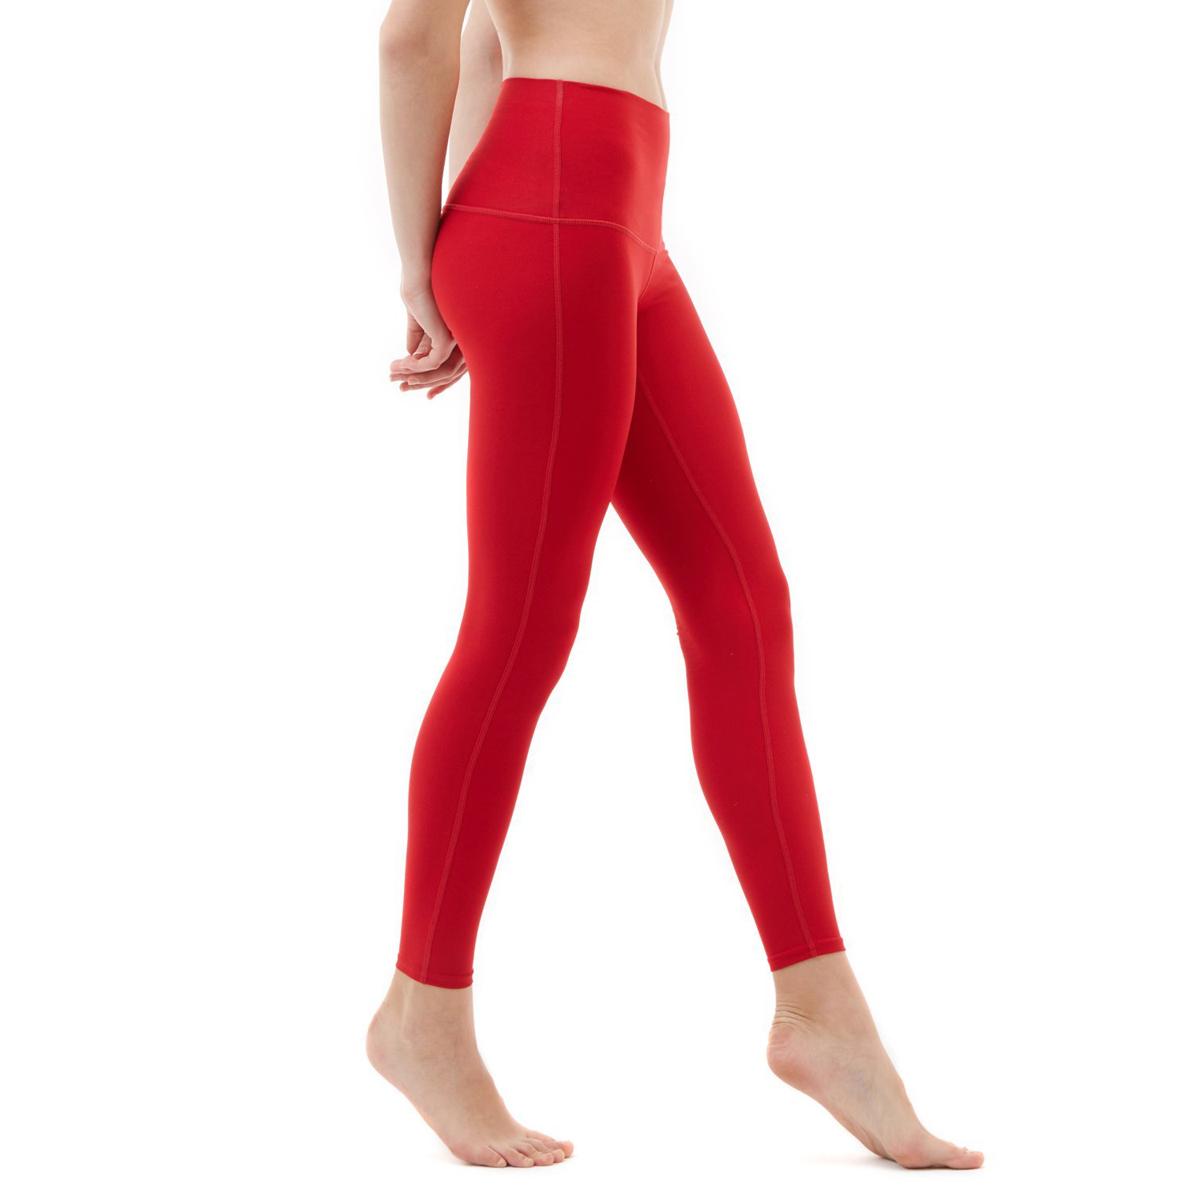 thumbnail 65 - TSLA Tesla FYP42 Women's High-Waisted Ultra-Stretch Tummy Control Yoga Pants